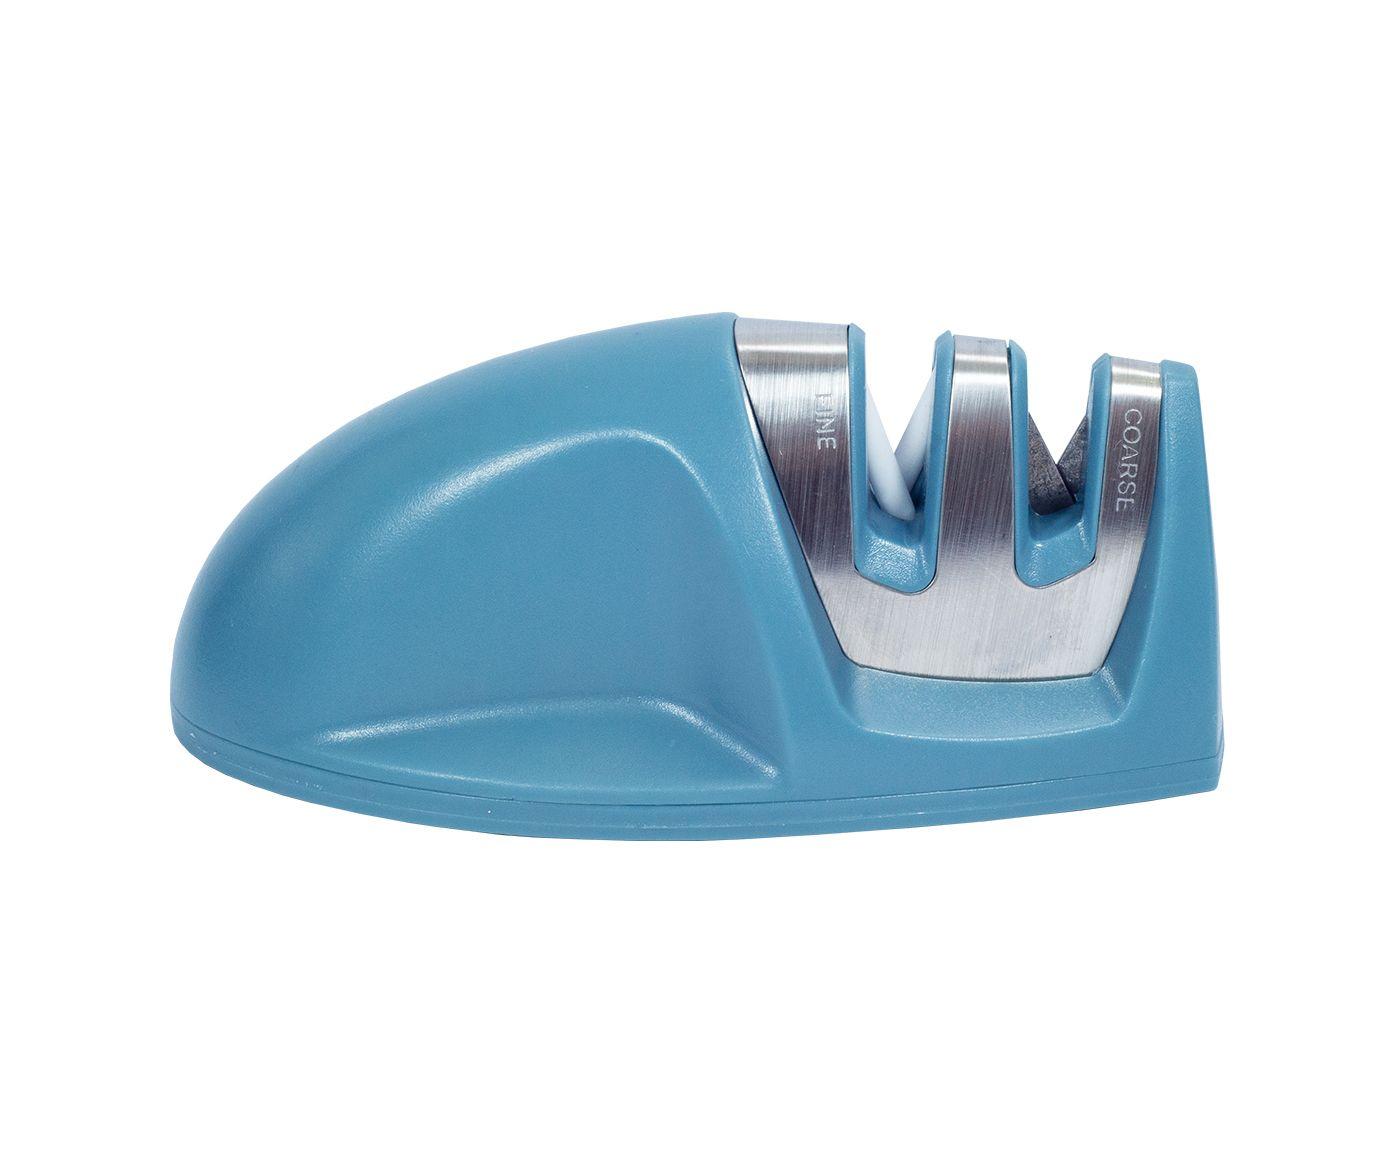 Afiador de Faca Helpful Azul - 4,5X10,2cm   Westwing.com.br